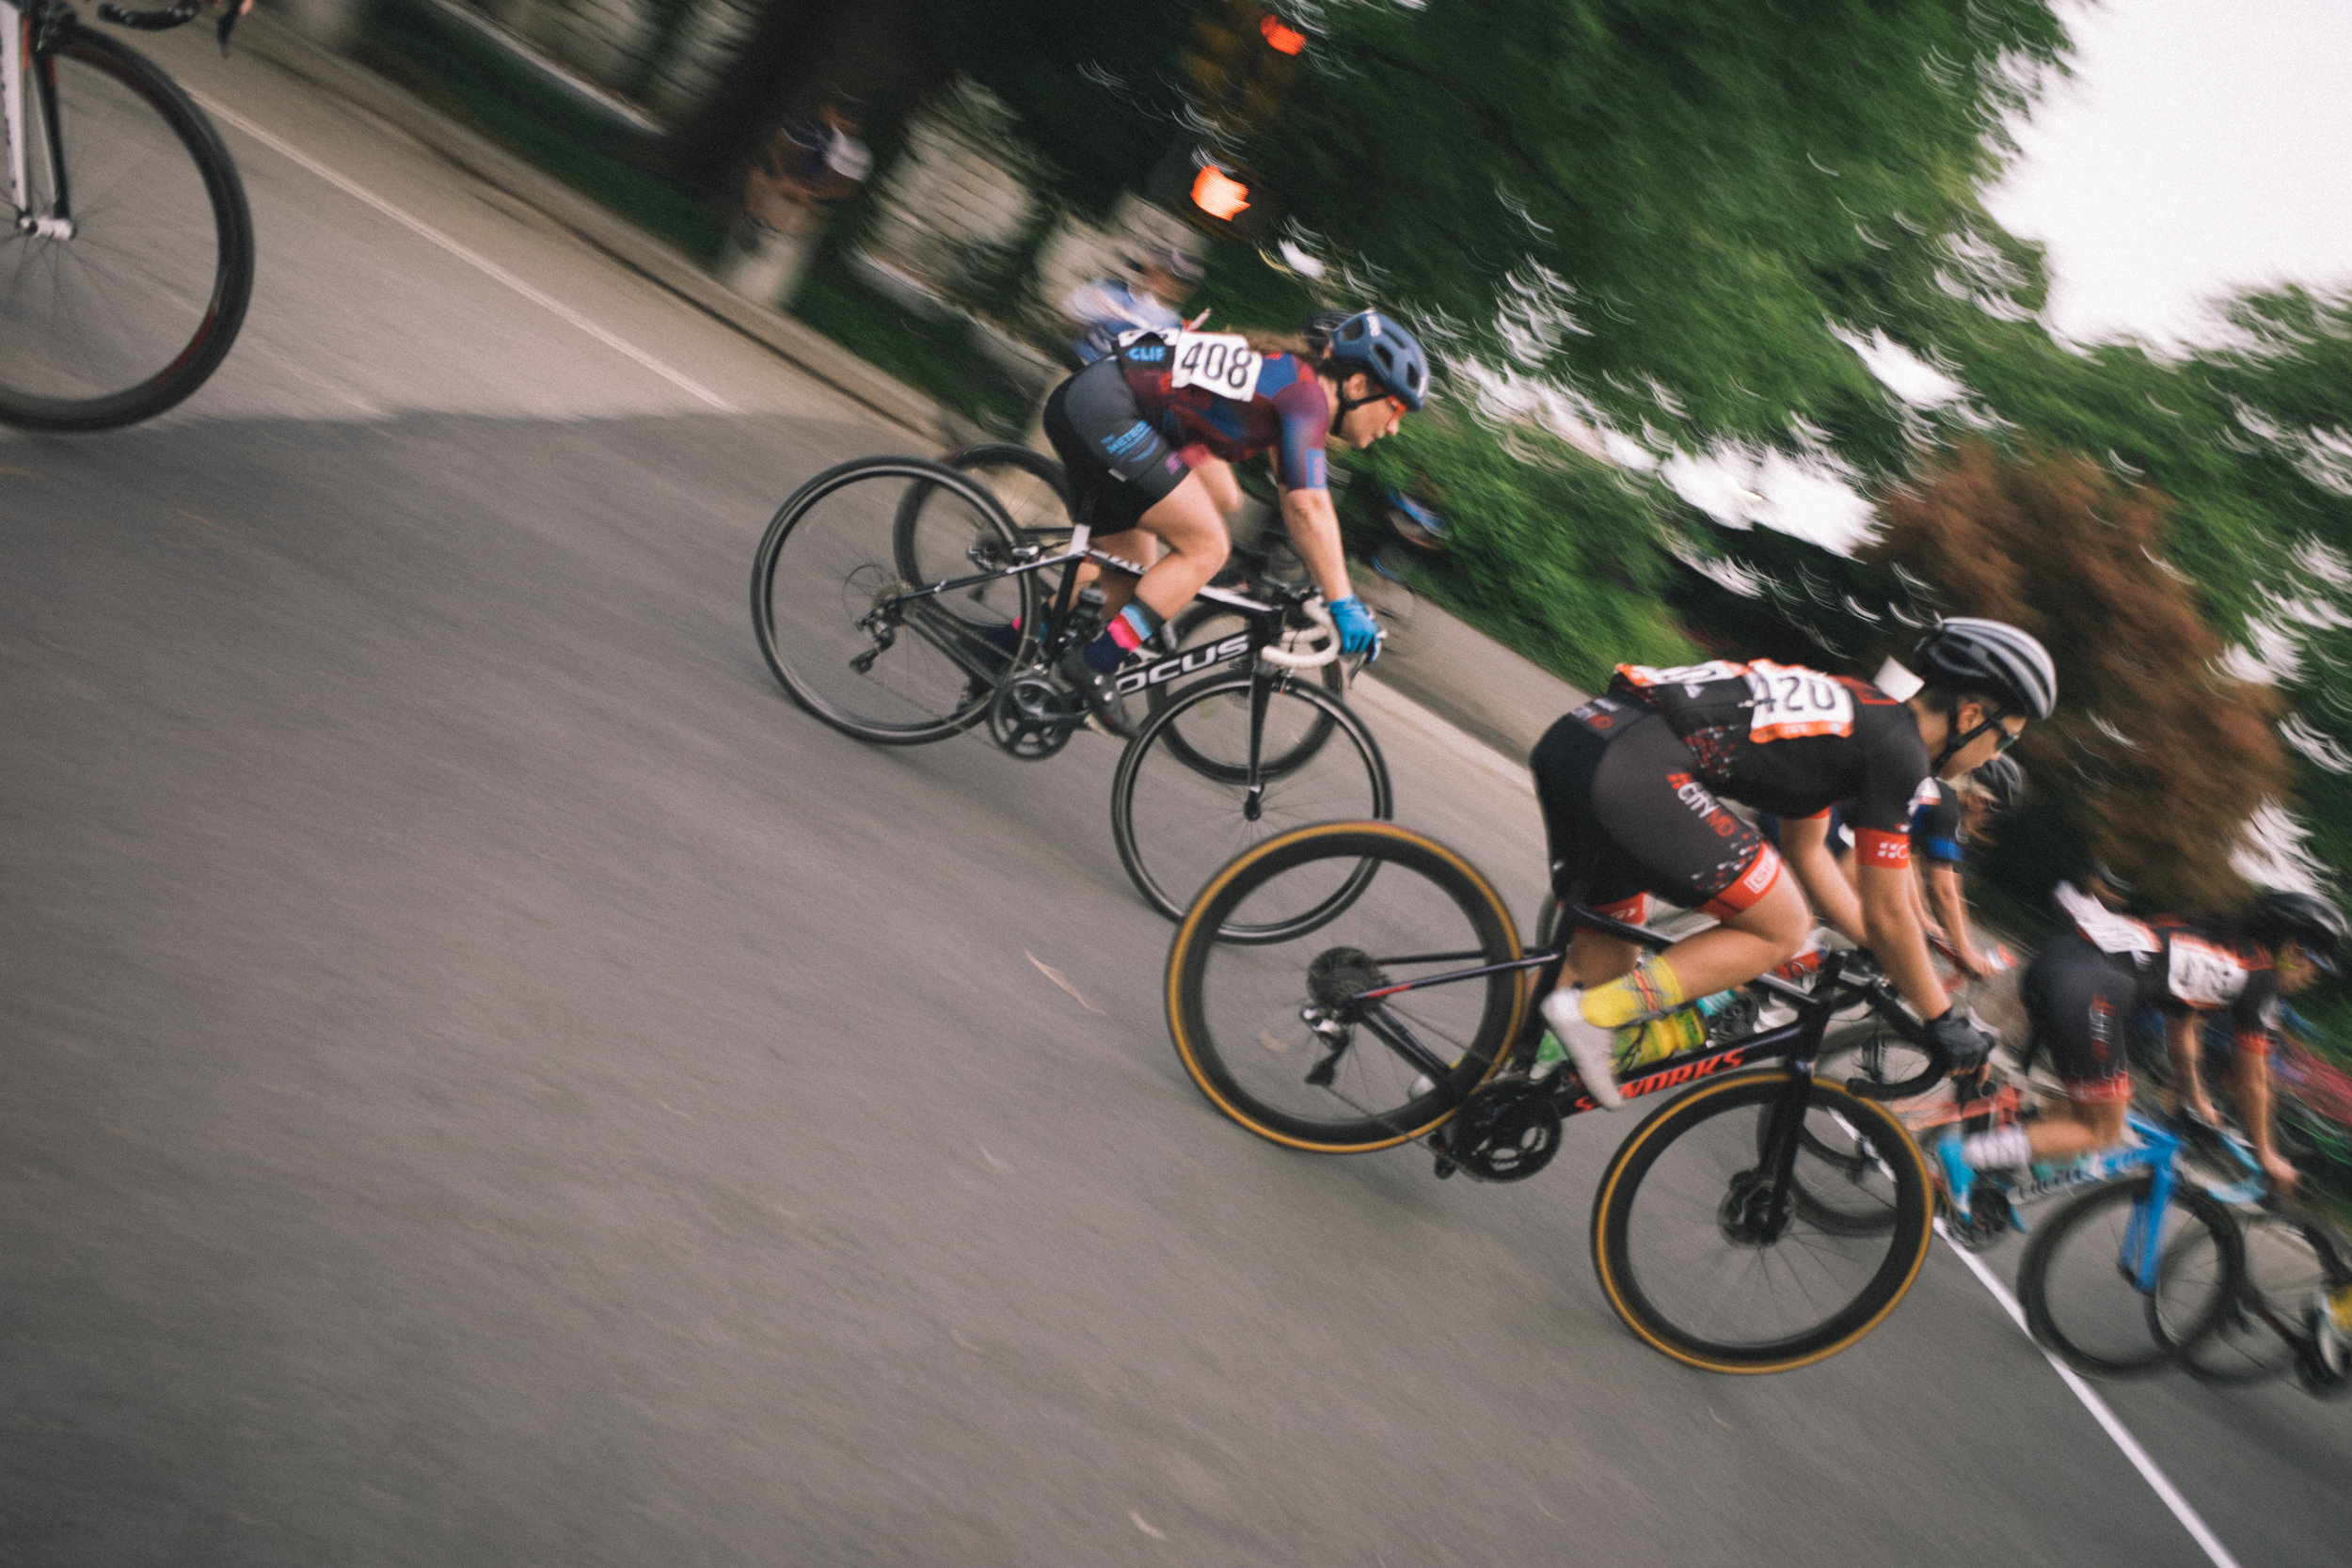 Photo Rhetoric - To Be Determined - Dave Jordan Central Park Classic-5032.jpg